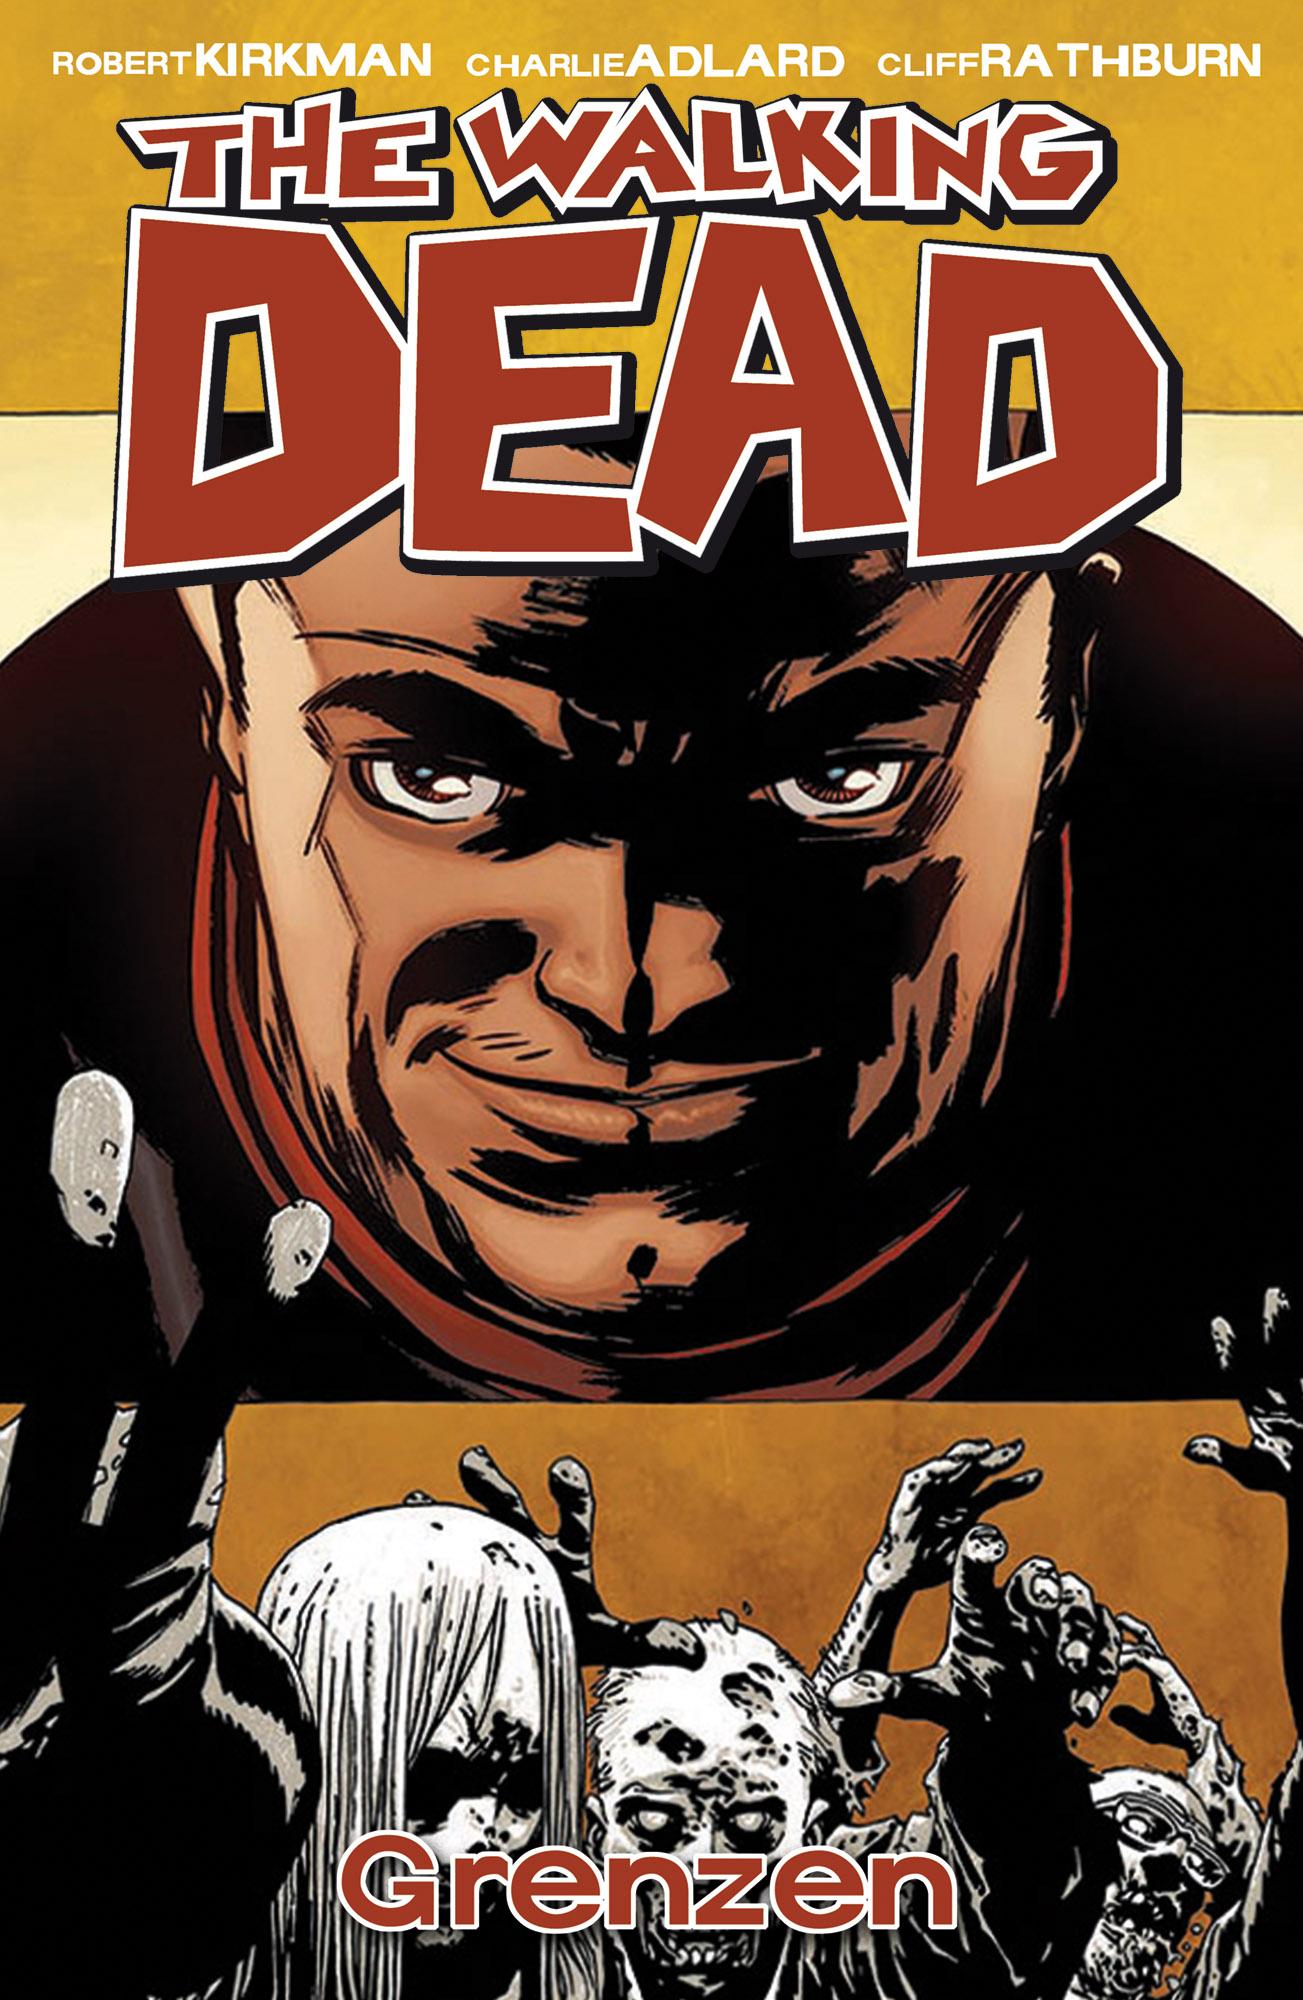 The Walking Dead: Band 18 - Grenzen - Robert Kirkman